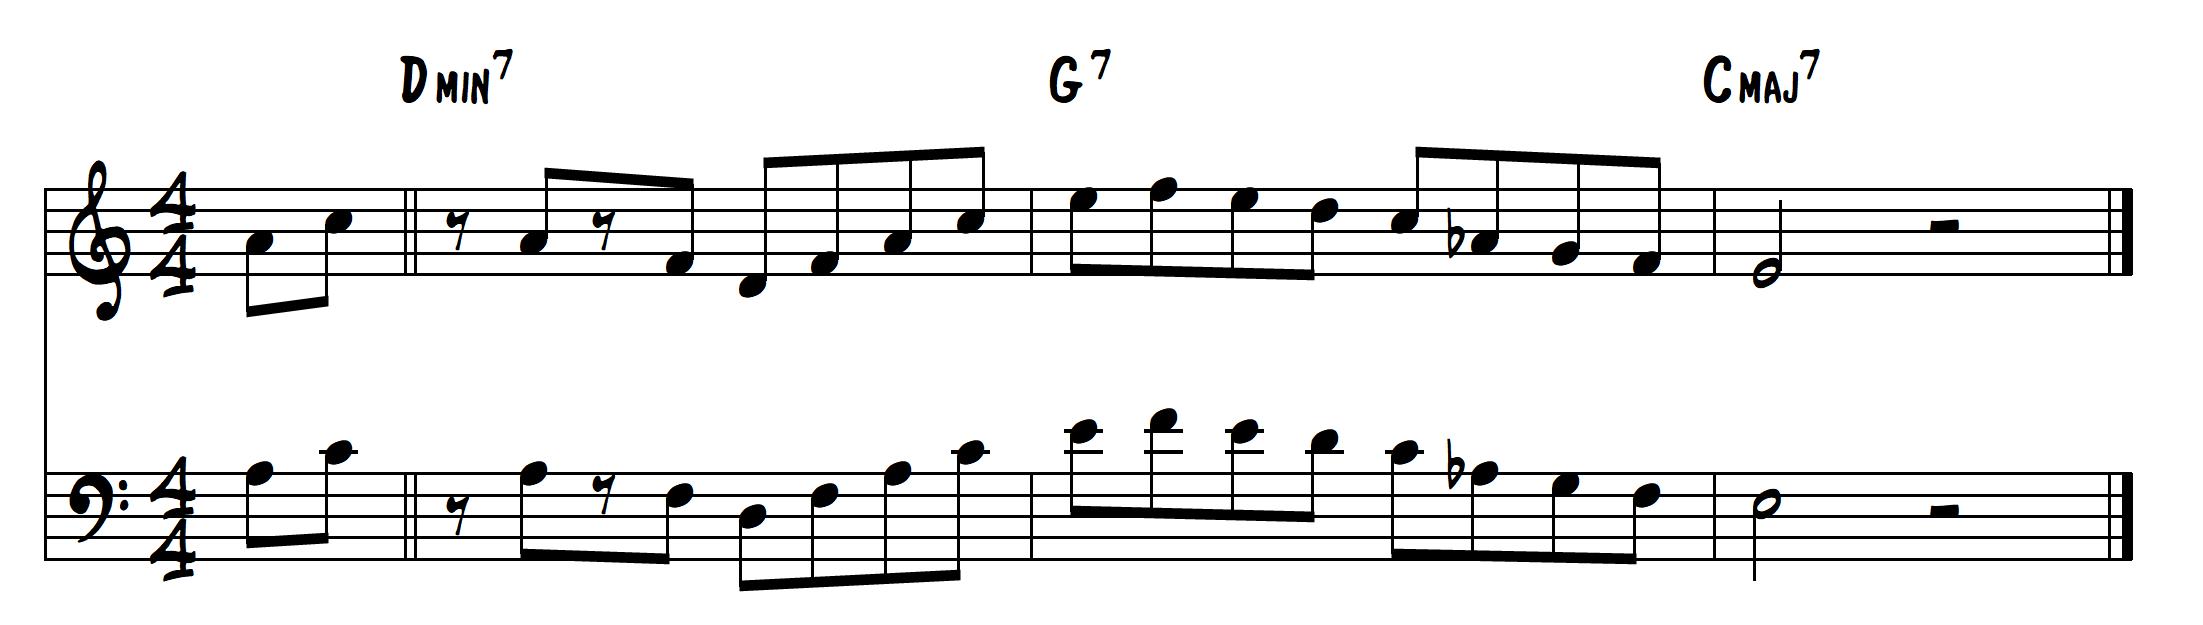 2-5-1 jazz lick